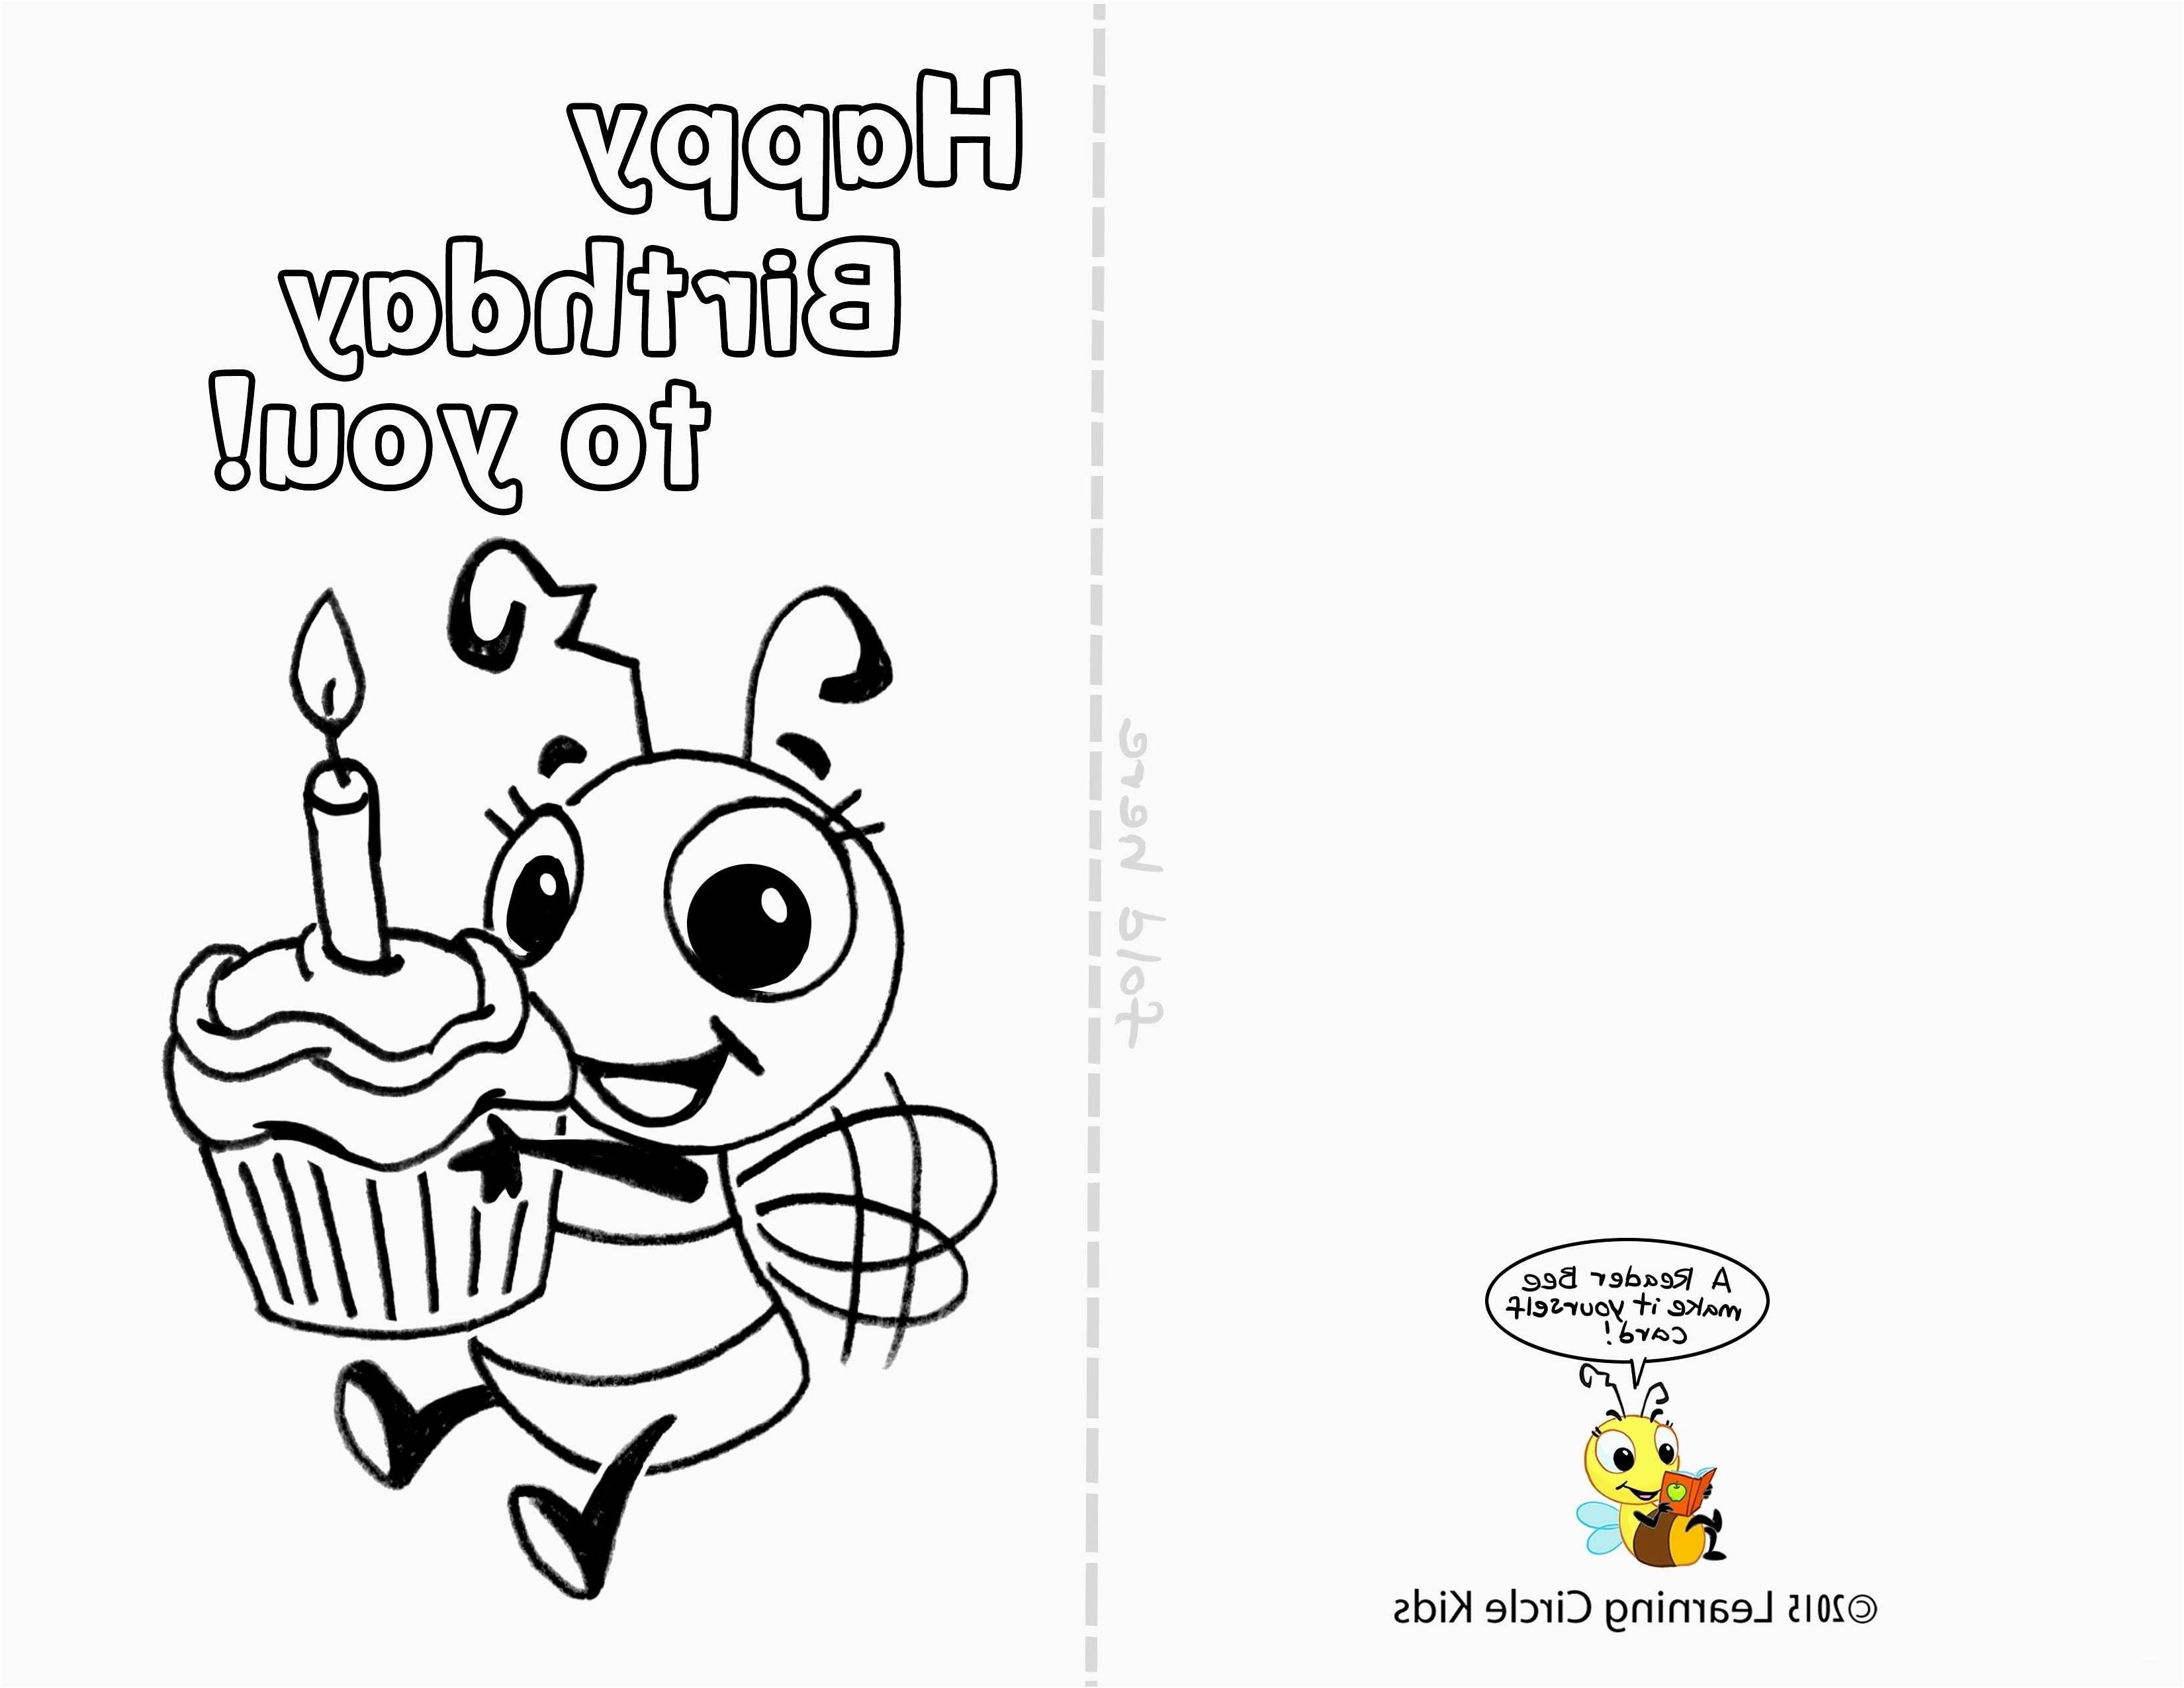 Printable Birthday Cards For Him 3Ldq Thank Congratulations Card - Free Printable Birthday Cards For Him